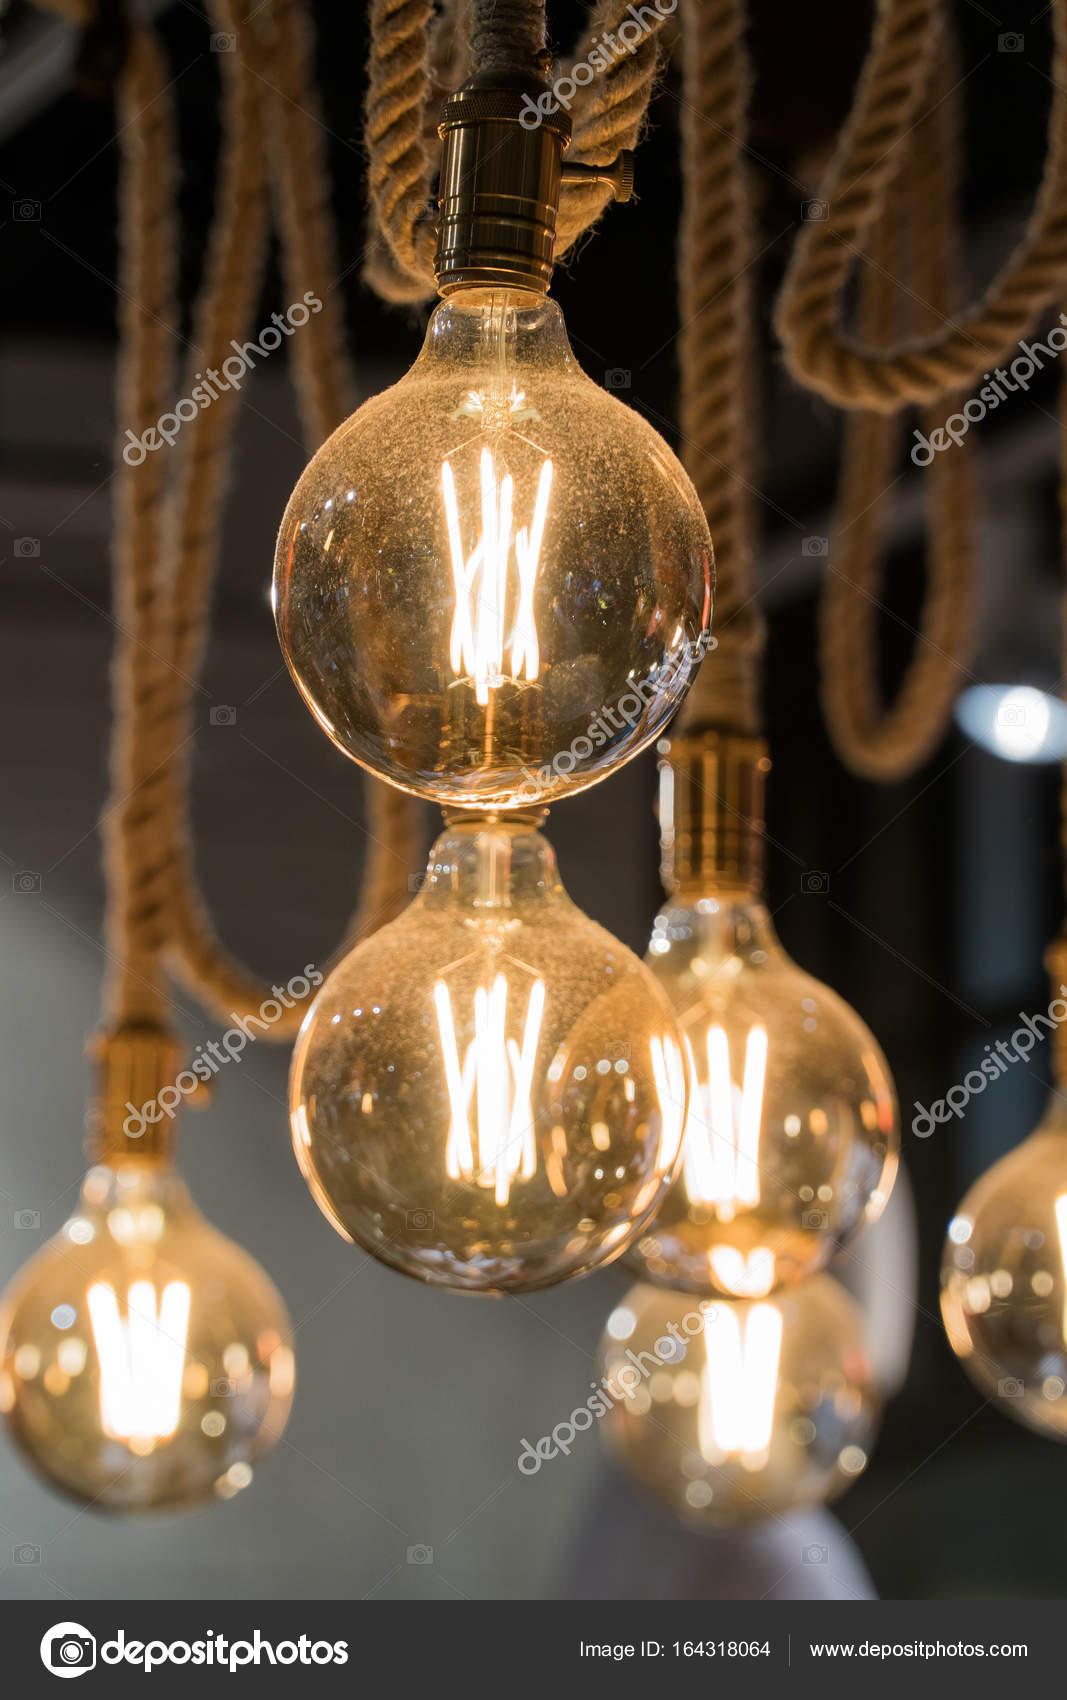 Vintage l mpadas fixadas em cordas elegante decora o do for Vintage lampen